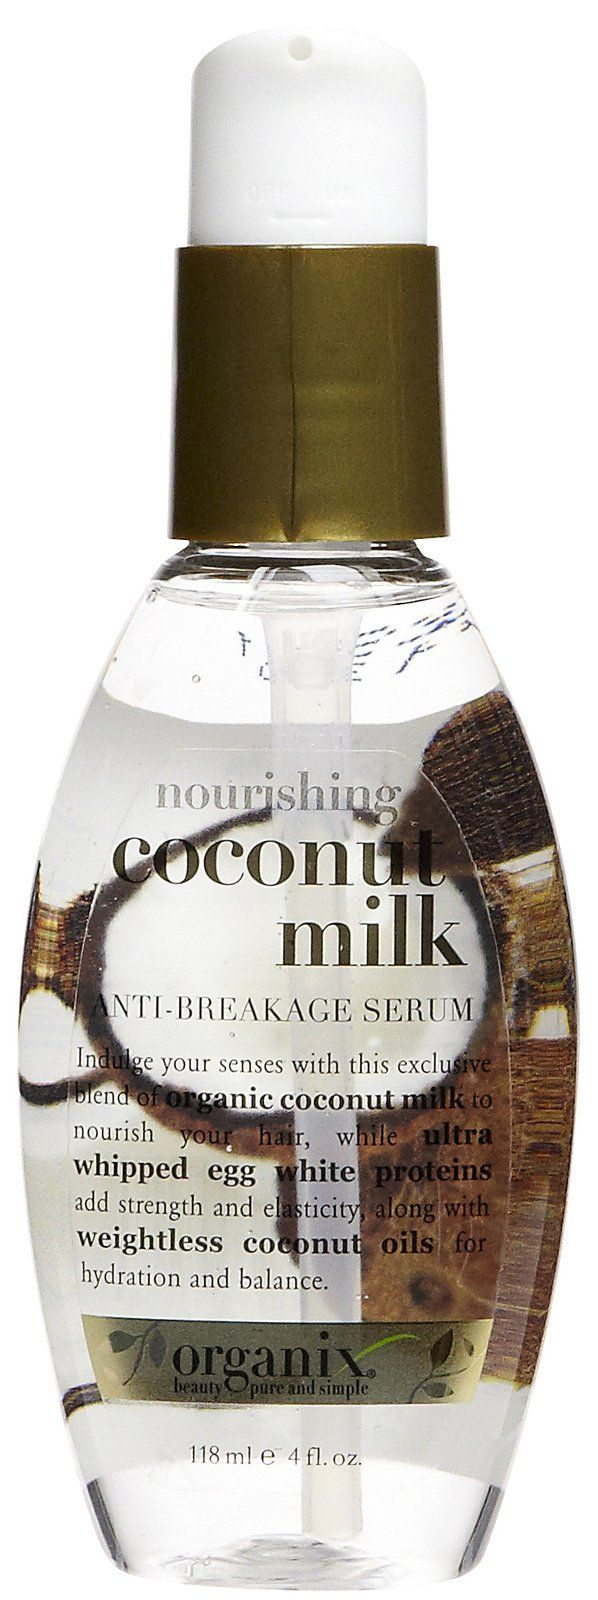 Great leave in treatment for hair.    Organix Nourishing Coconut Milk Leave-In Milk - Best Price